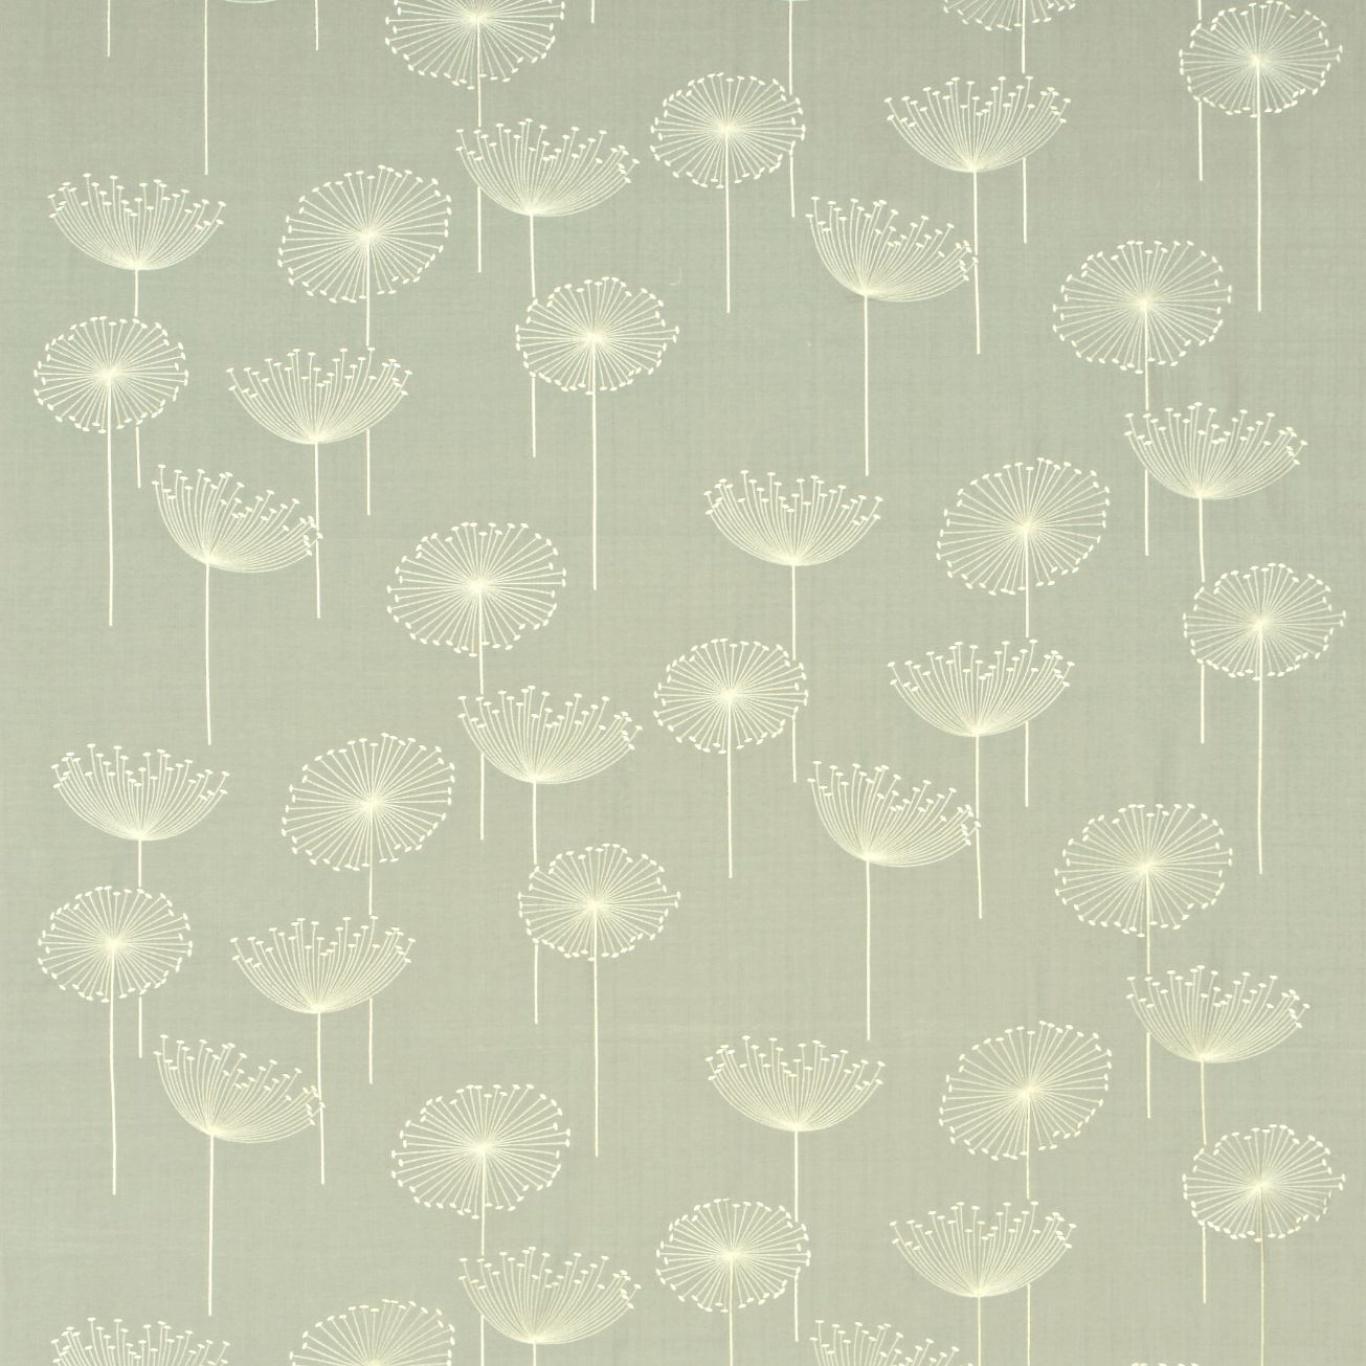 Image of Sanderson Dandelion Clocks Embroidery Silver/Ivory Fabric DOPEDA305